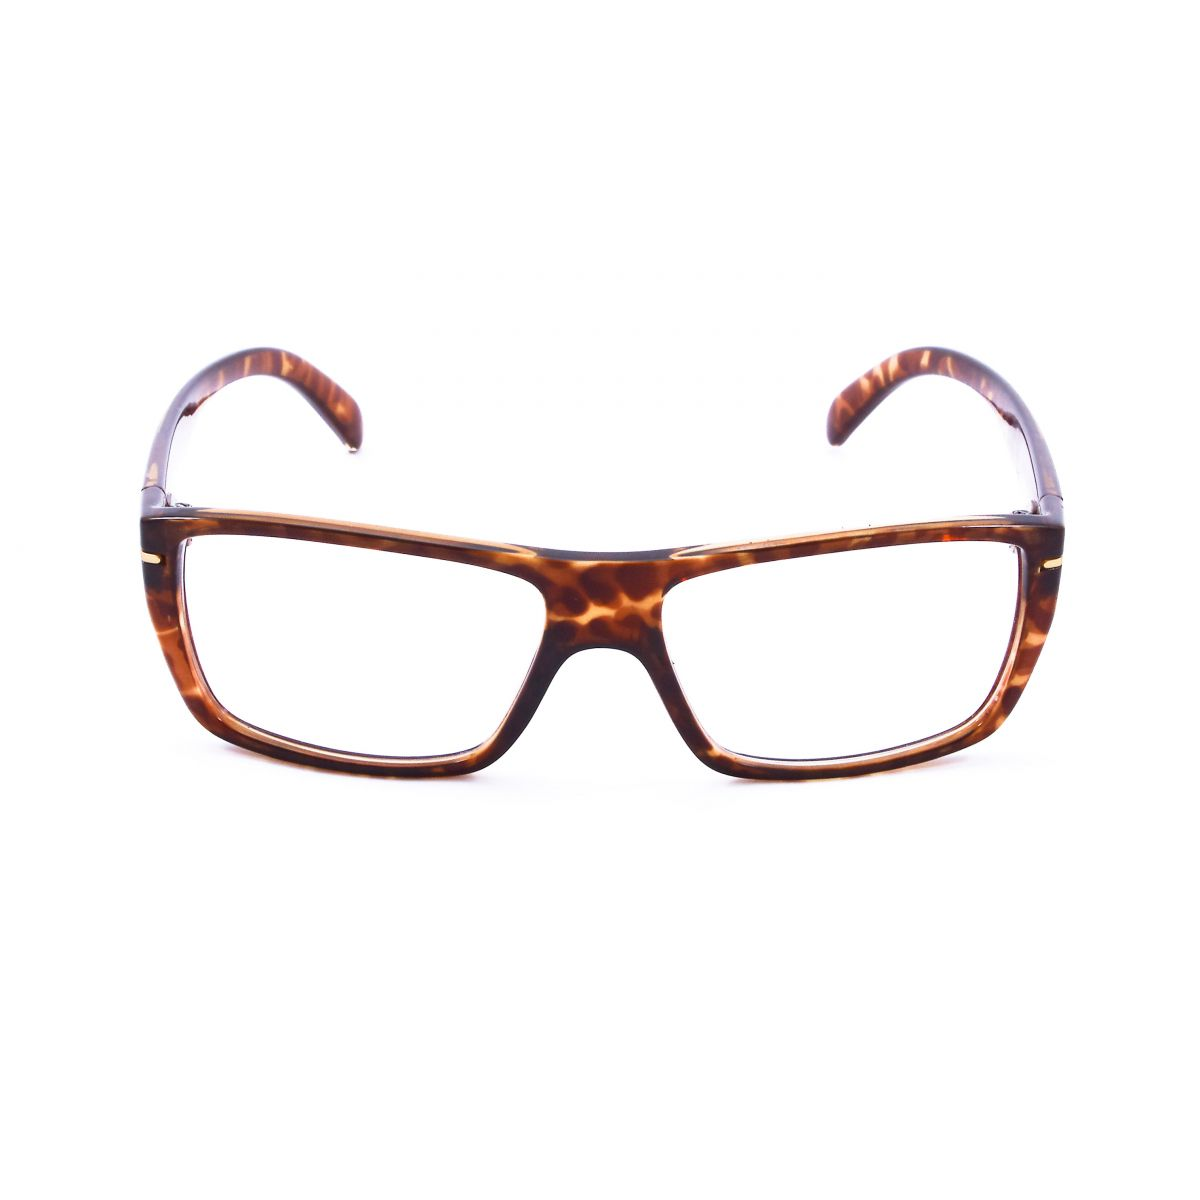 5dd19c948 Óculos De Grau Masculino Hb M93023629 Tam.54HBHBCompra segura ...